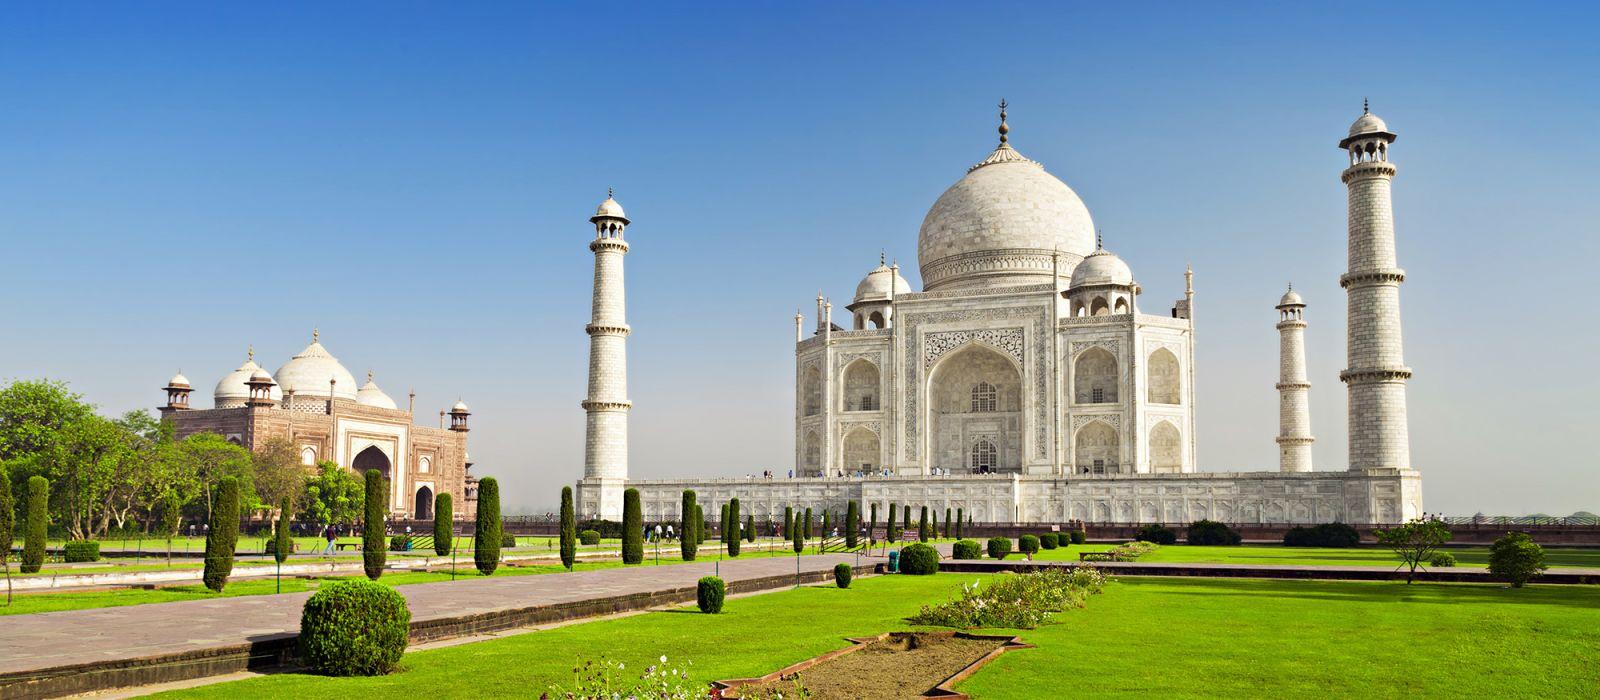 Luxurious Rajasthan and the Taj Mahal: Oberoi Special Tour Trip 2